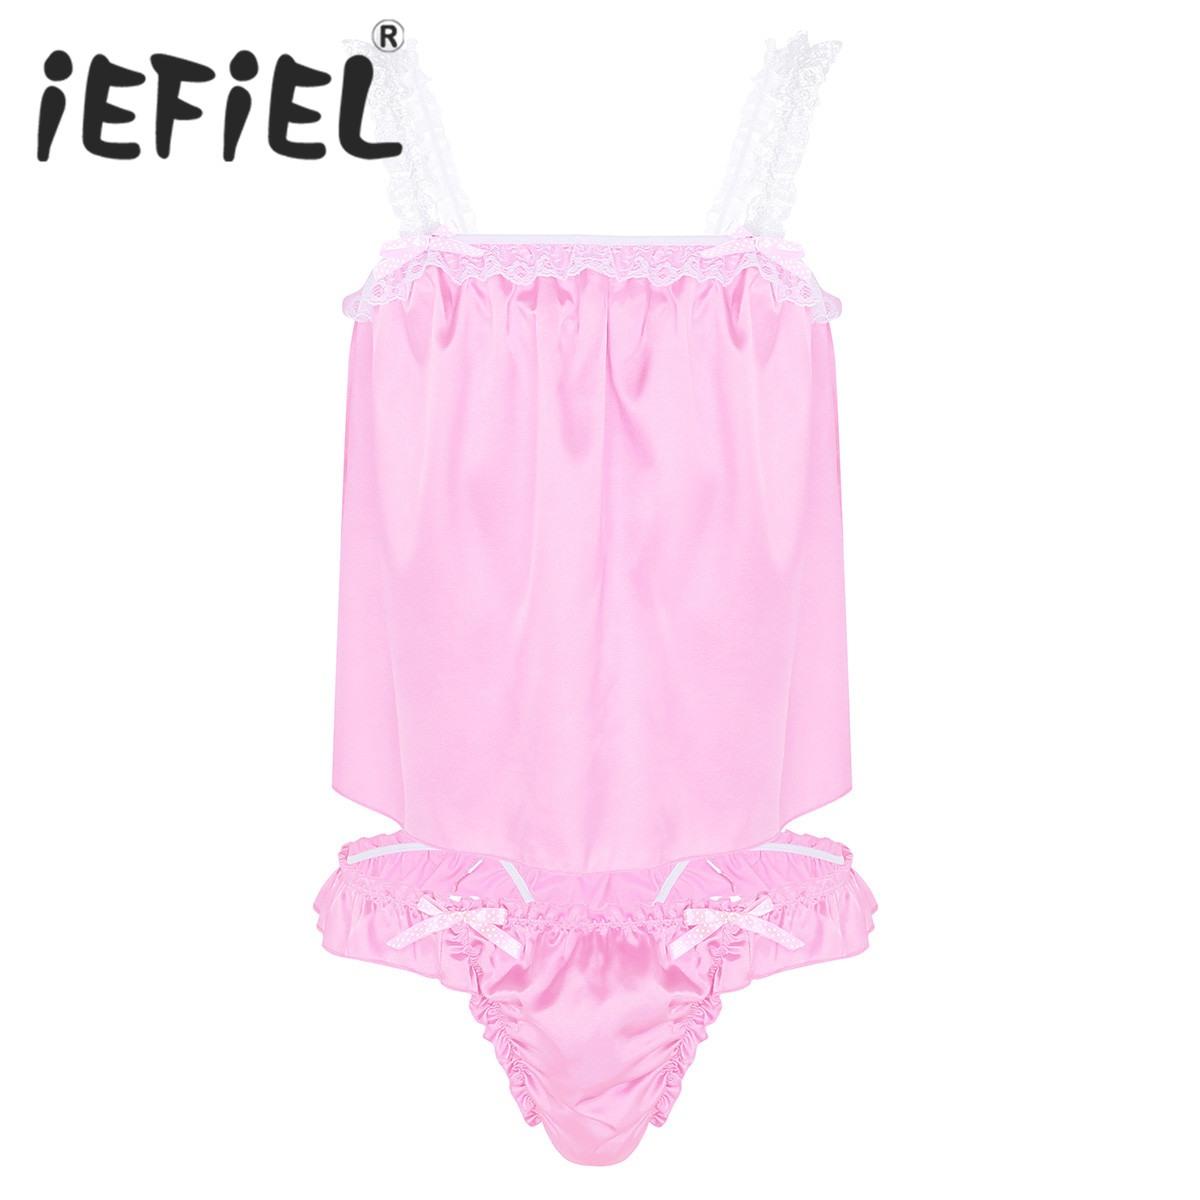 New Arrival Mens Sissy Lingerie Set Soft Shiny Satin Tops with Ruffled Bikini Briefs Sexy Underwear Panties Nightwear Sleepwear